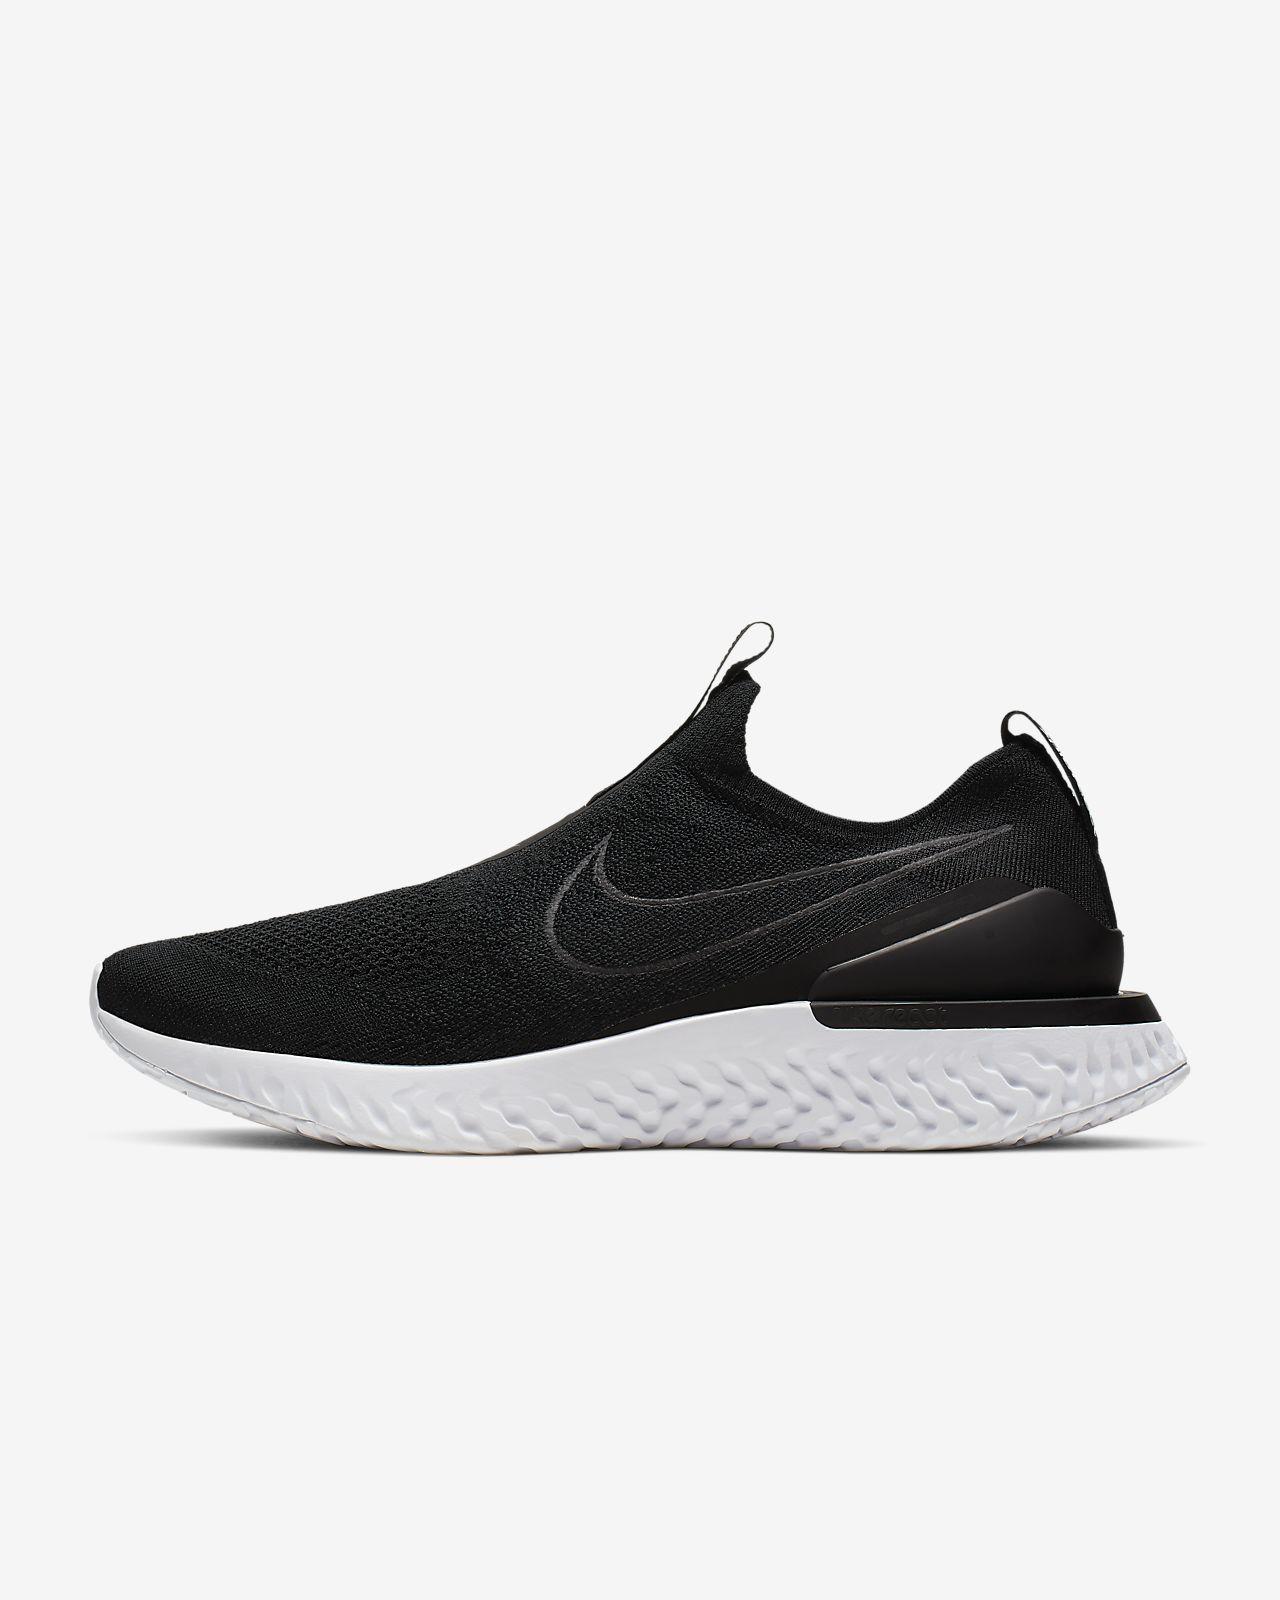 Chaussure de running Nike Epic Phantom React Flyknit pour Homme